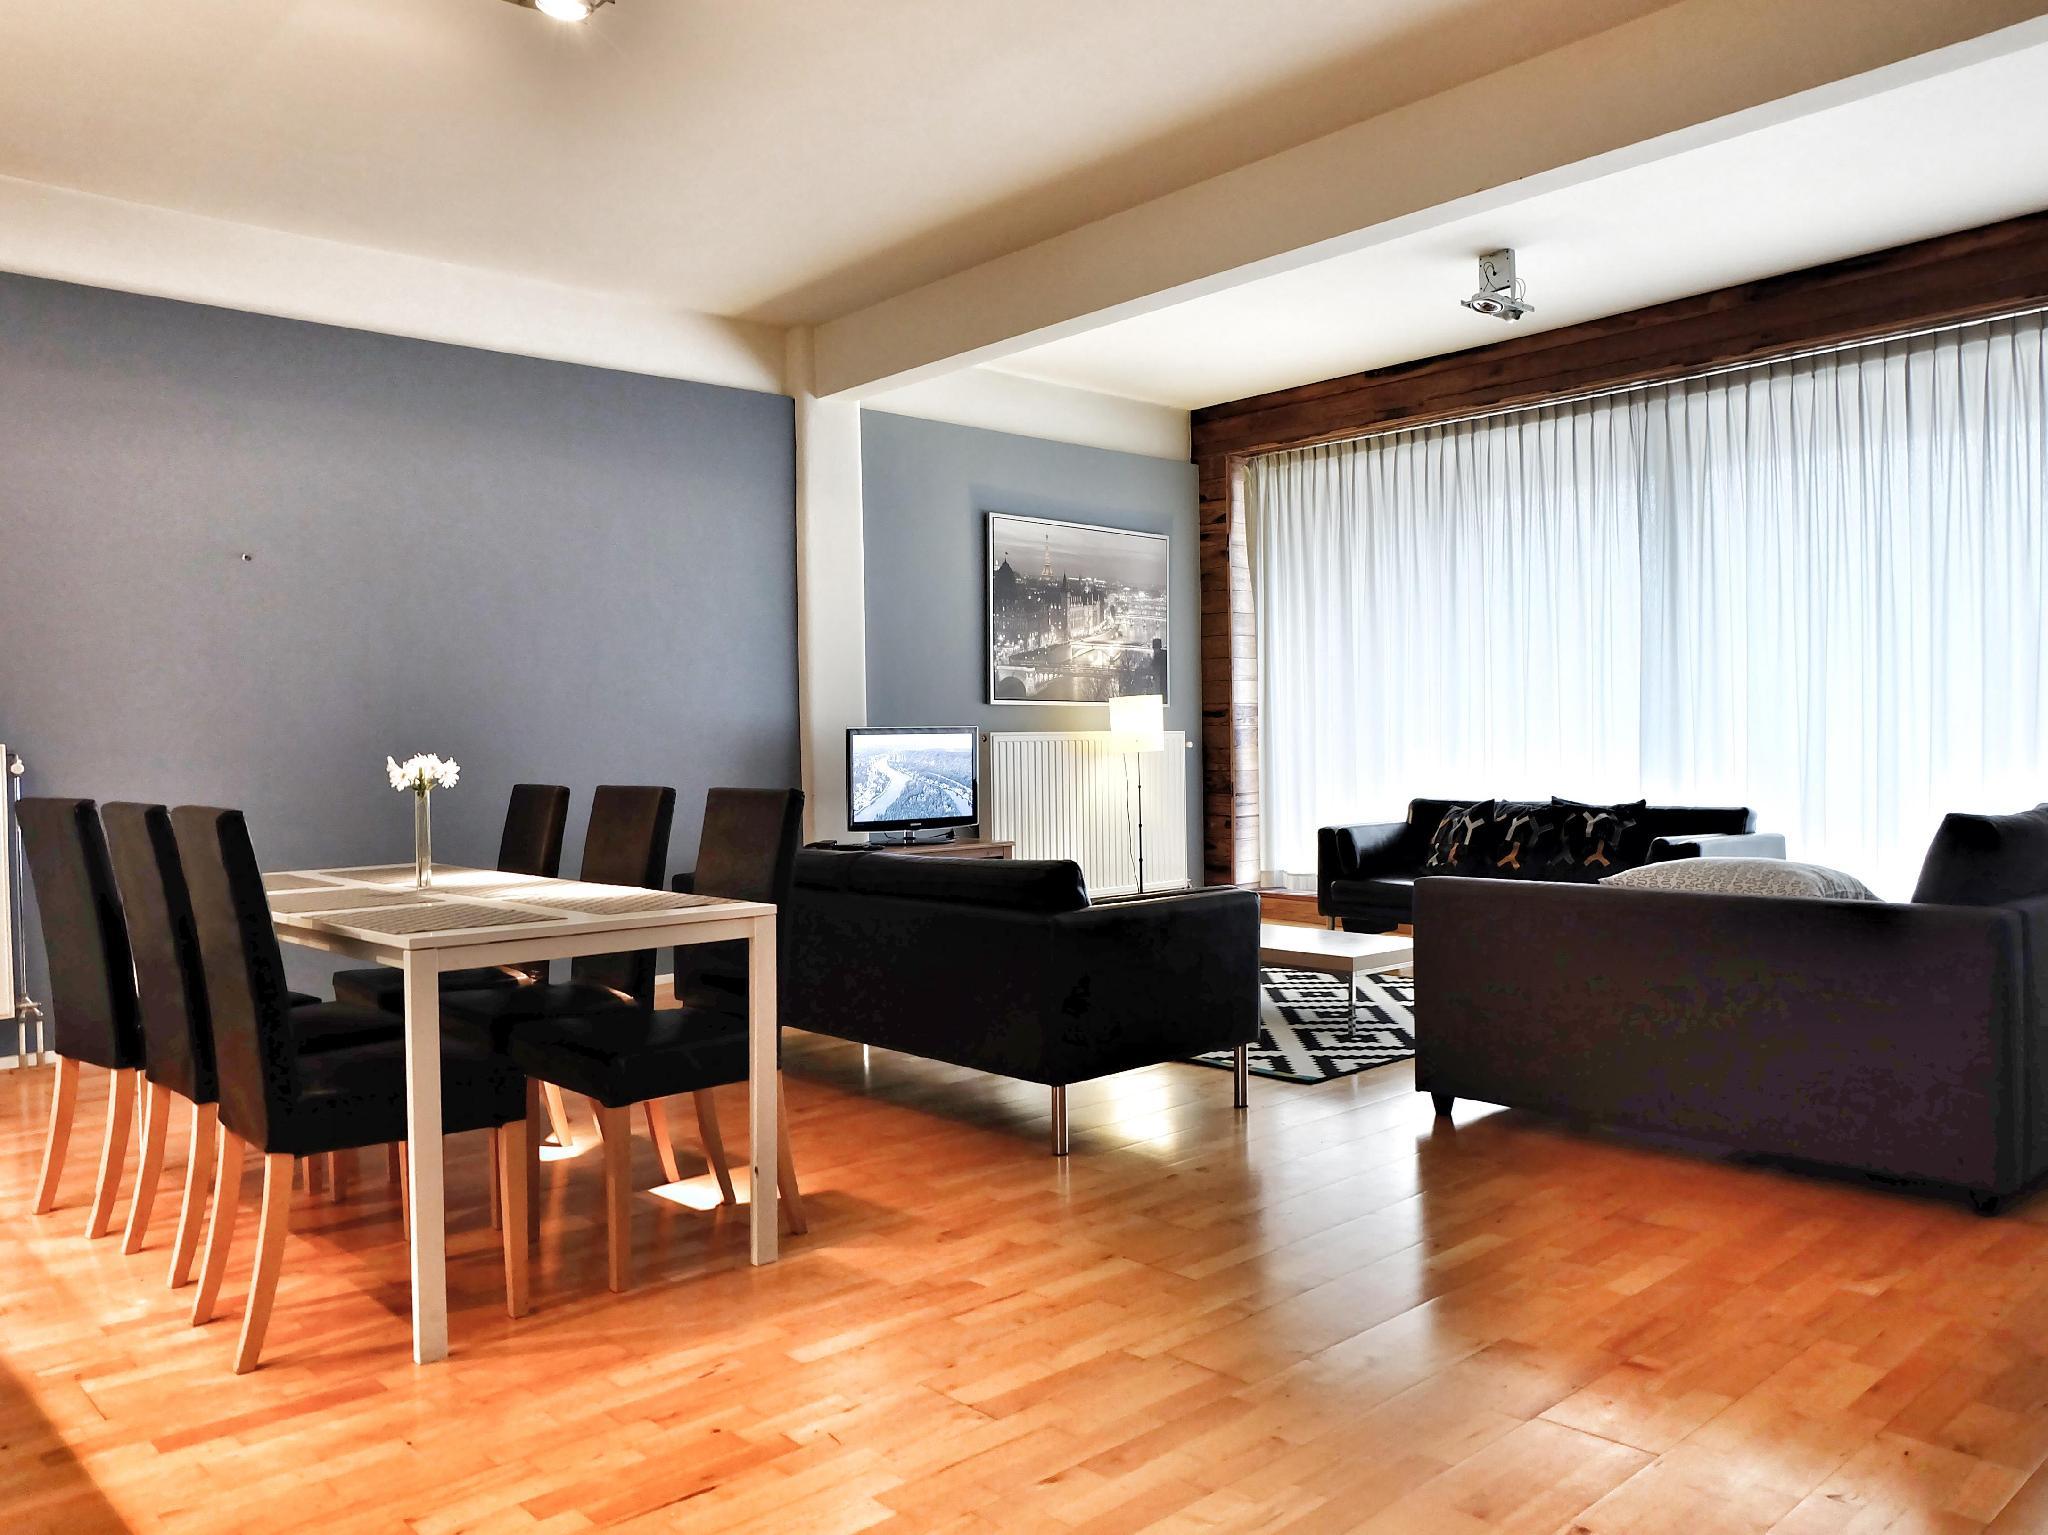 Captivating ApartmentsApart Brussels